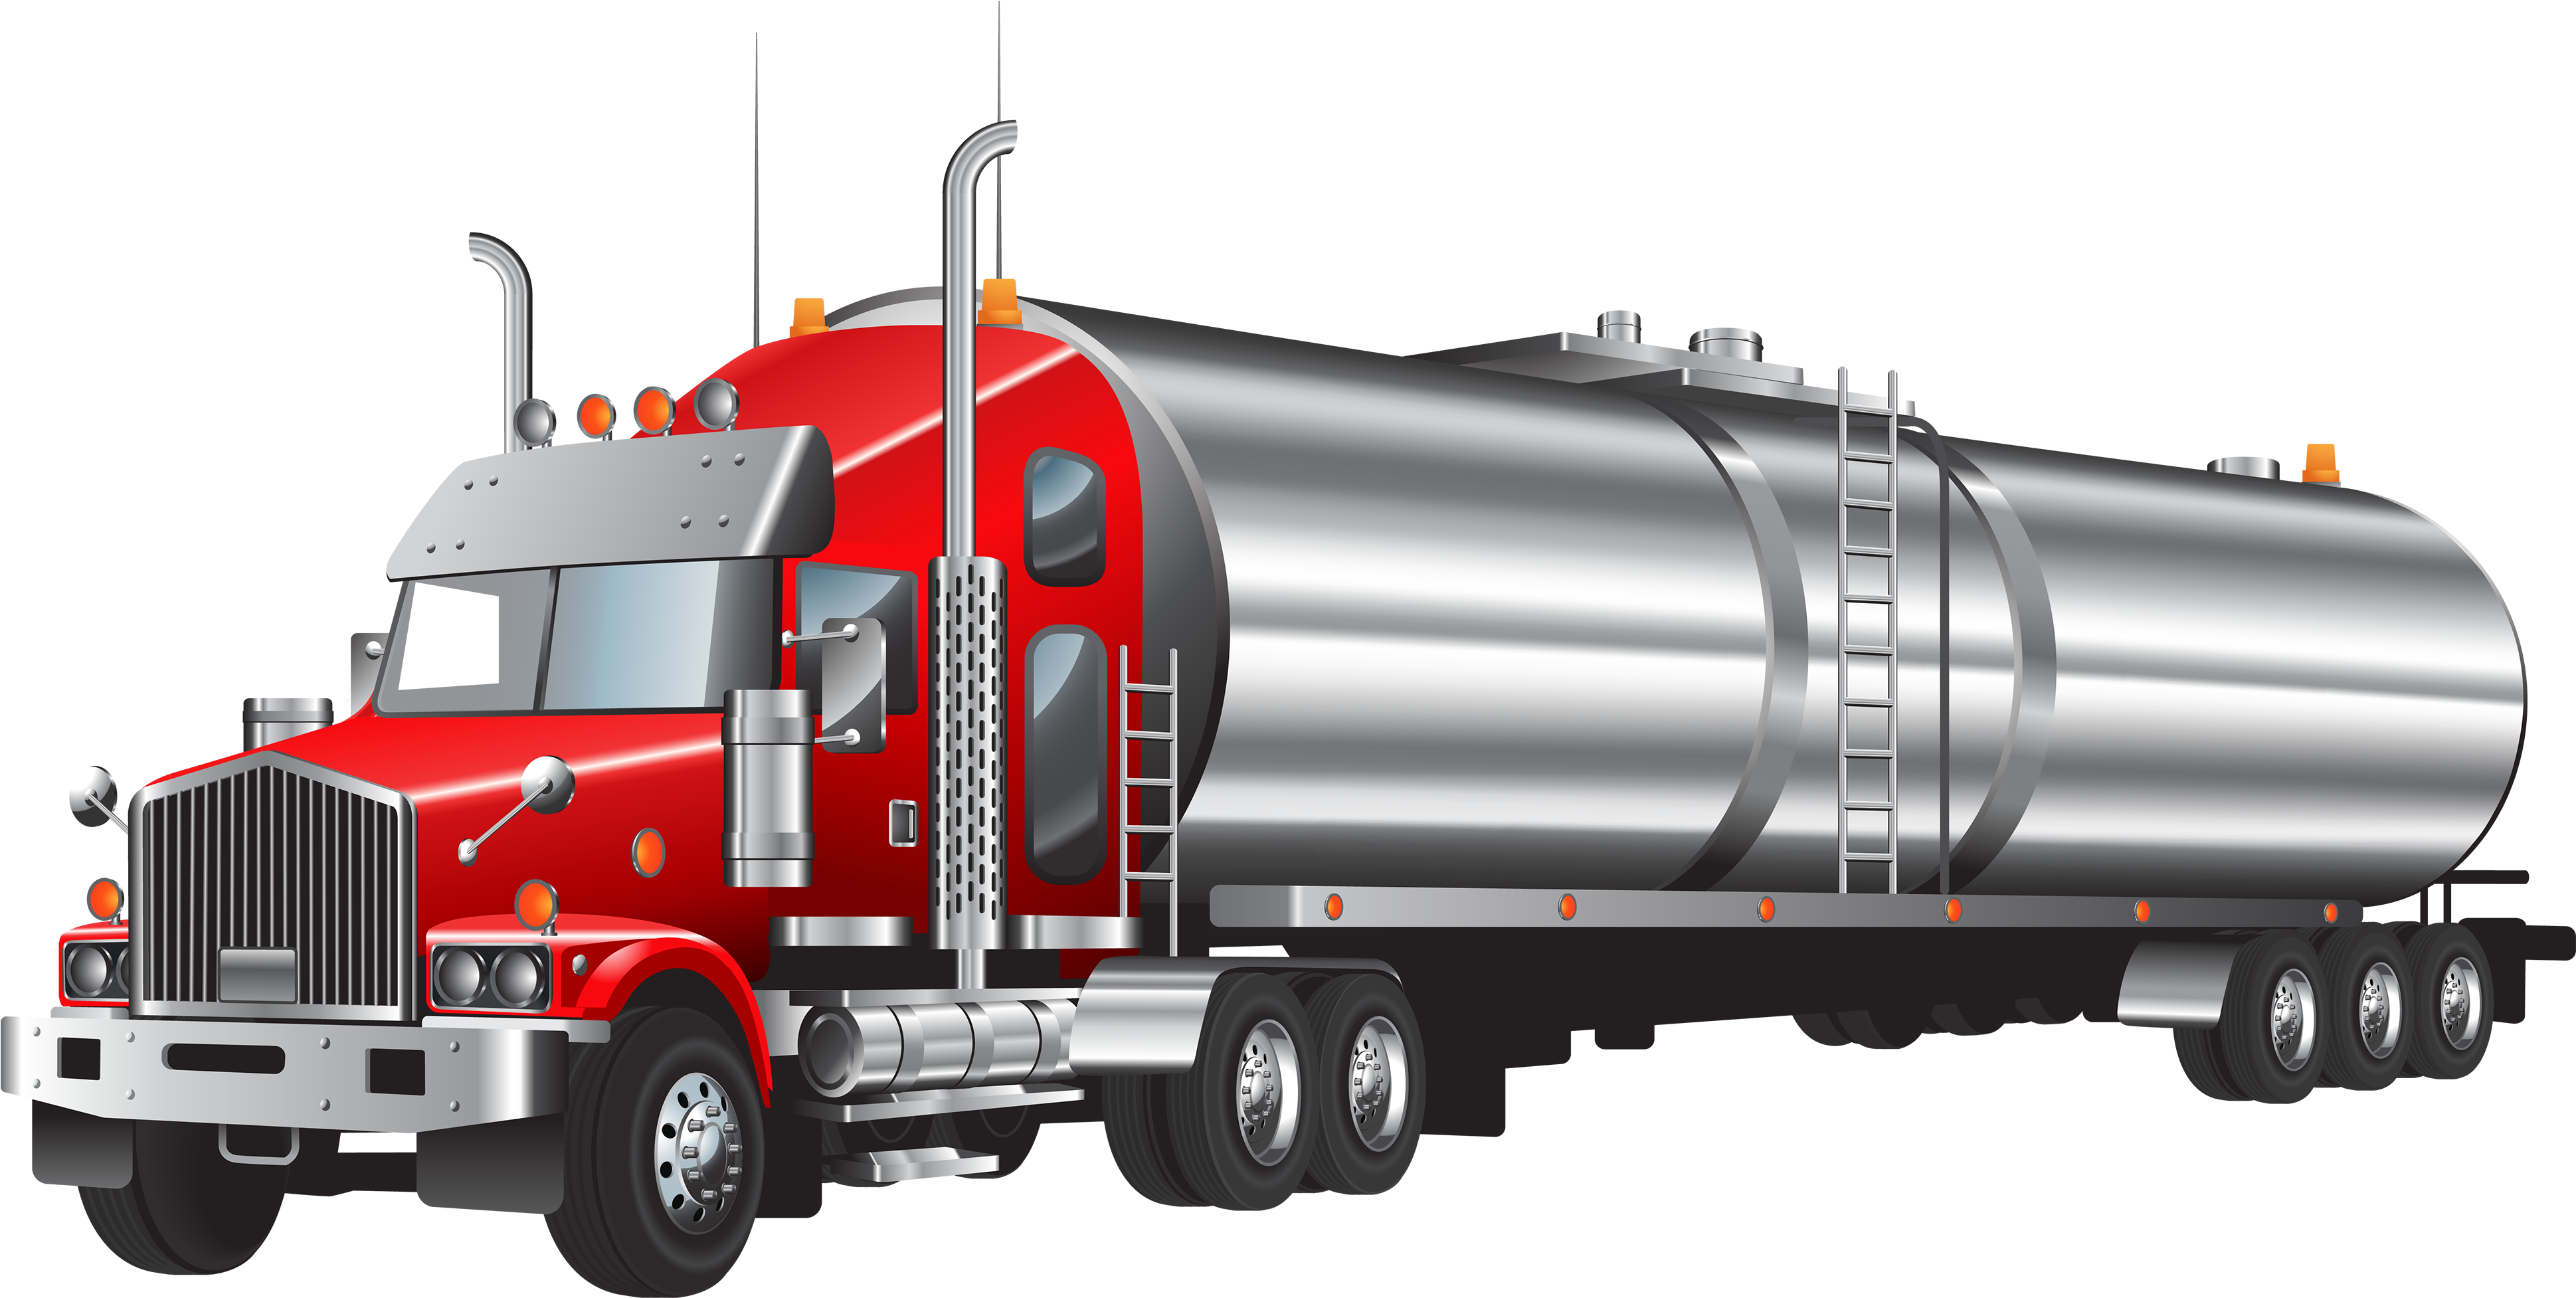 Fire Truck Clipart Truk Oil Tanker Truck Png.